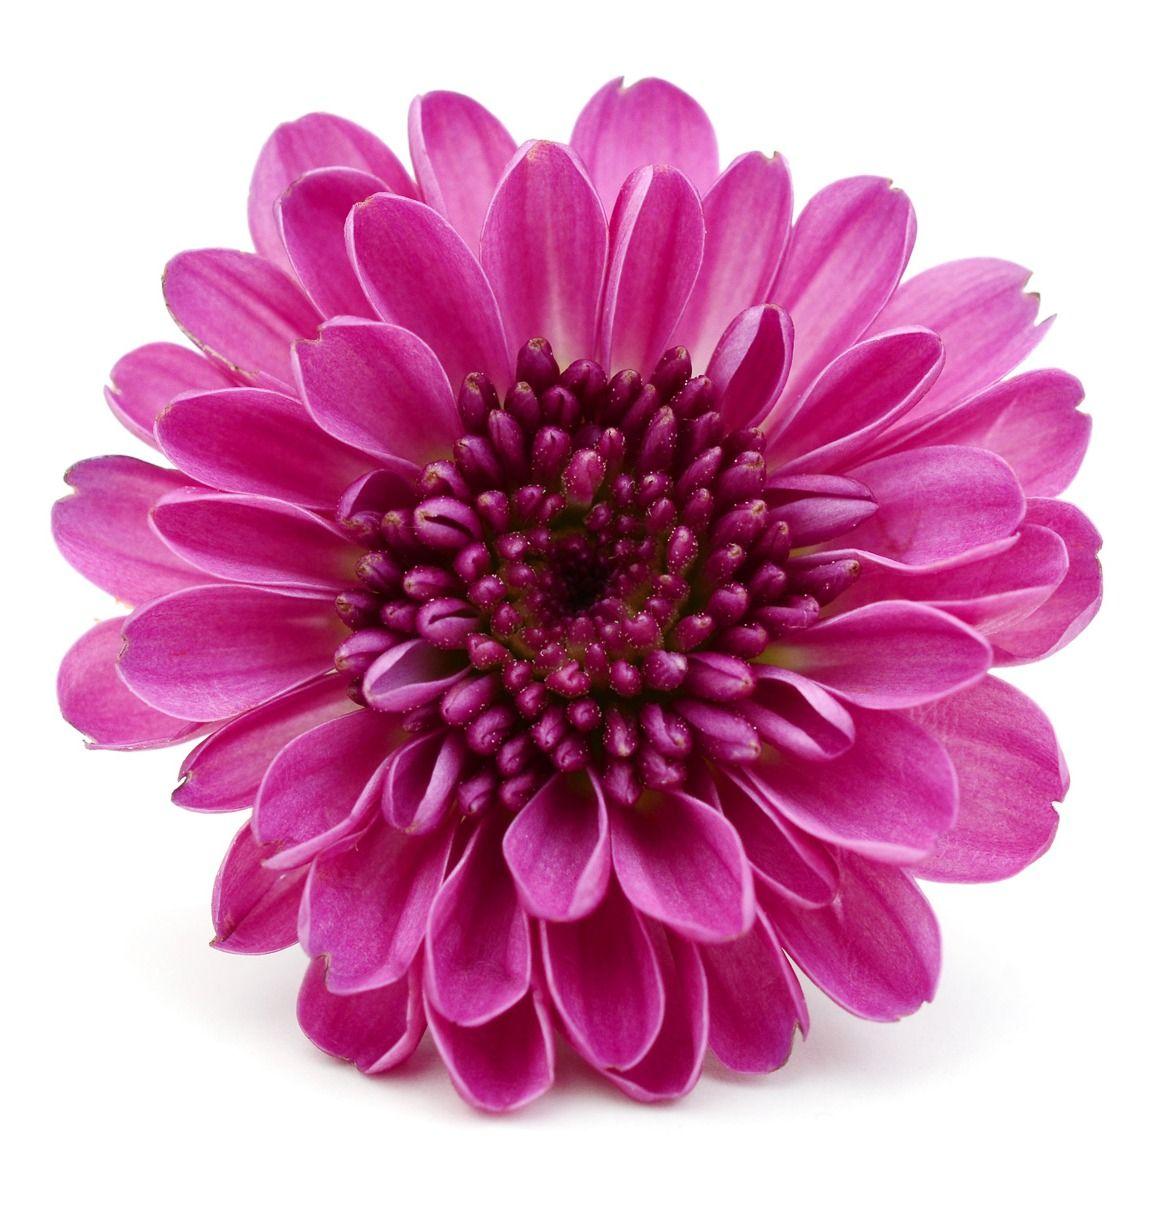 Wedding flowers chrysanthemum birthday month november colors florist naples fl flower delivery jardin floral design naples fl mightylinksfo Image collections